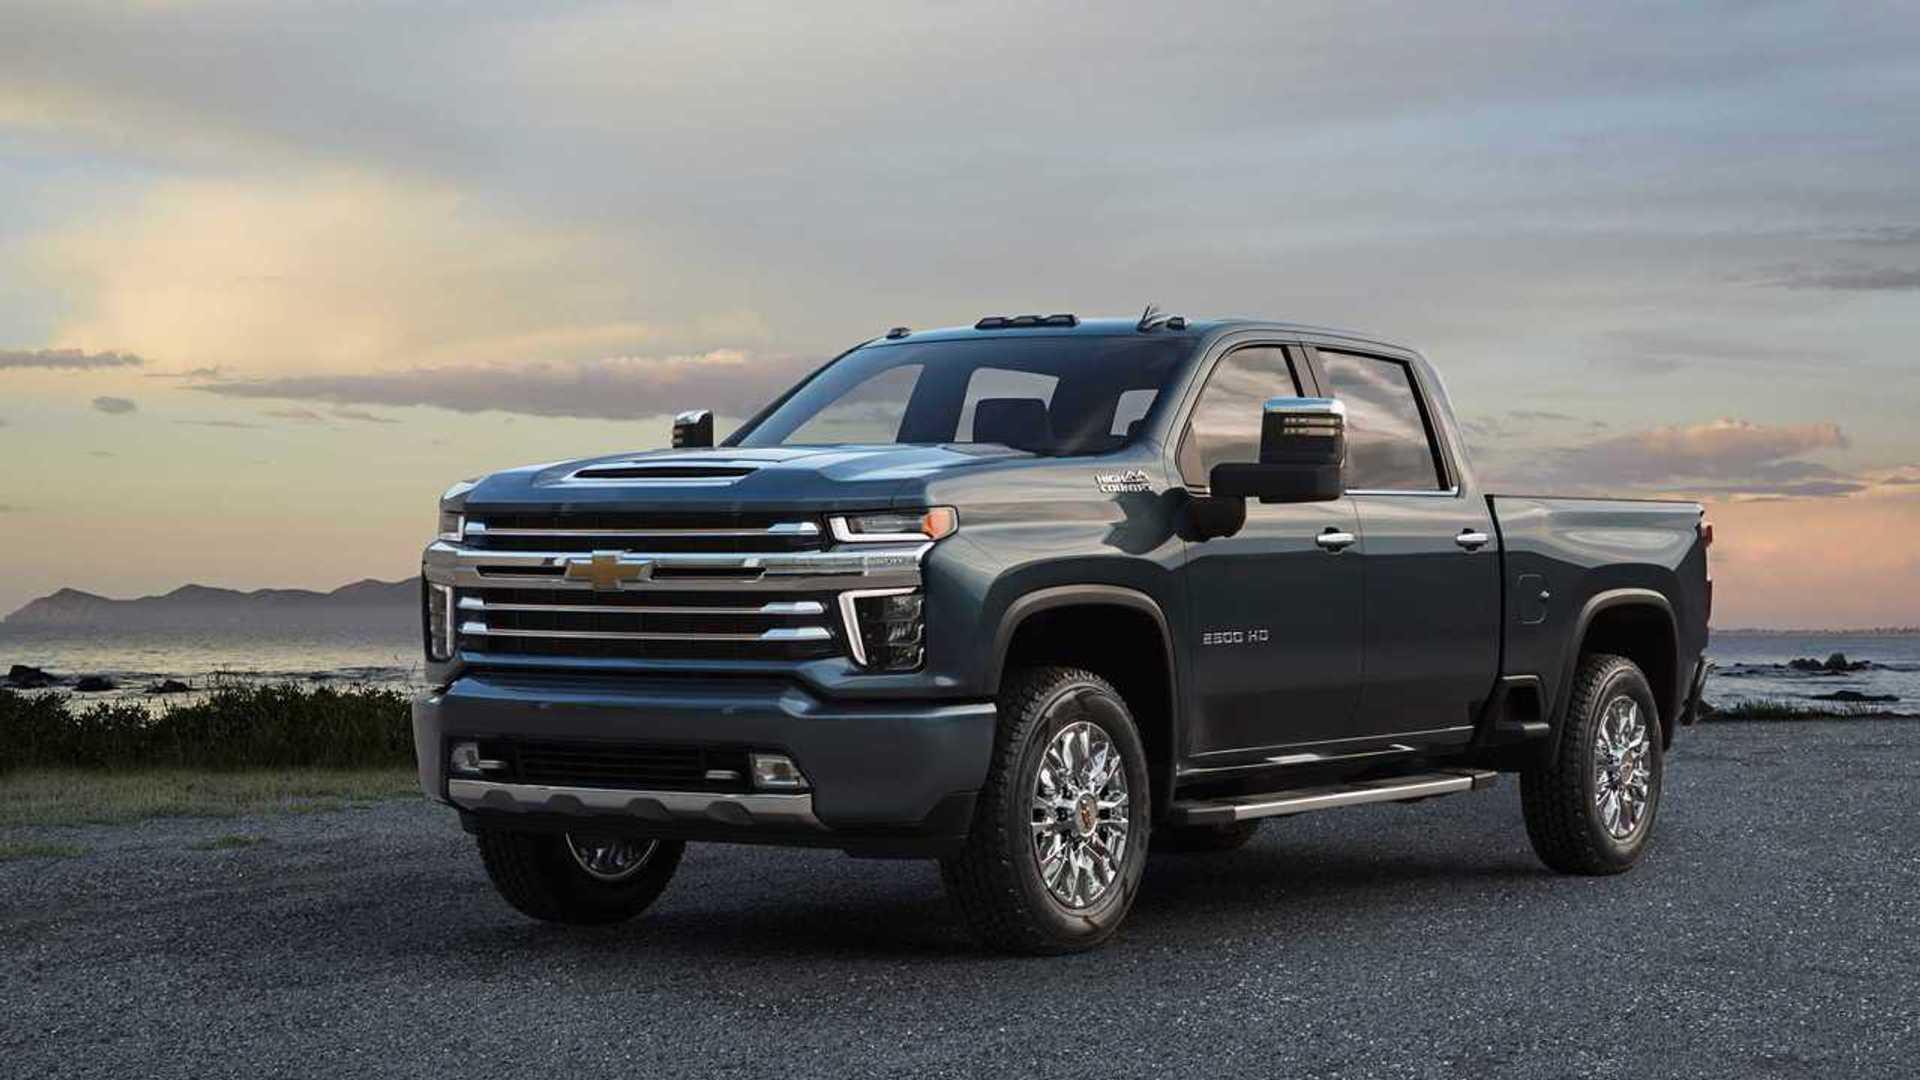 General Motors Confirms Electric Pickup Truck Is Coming